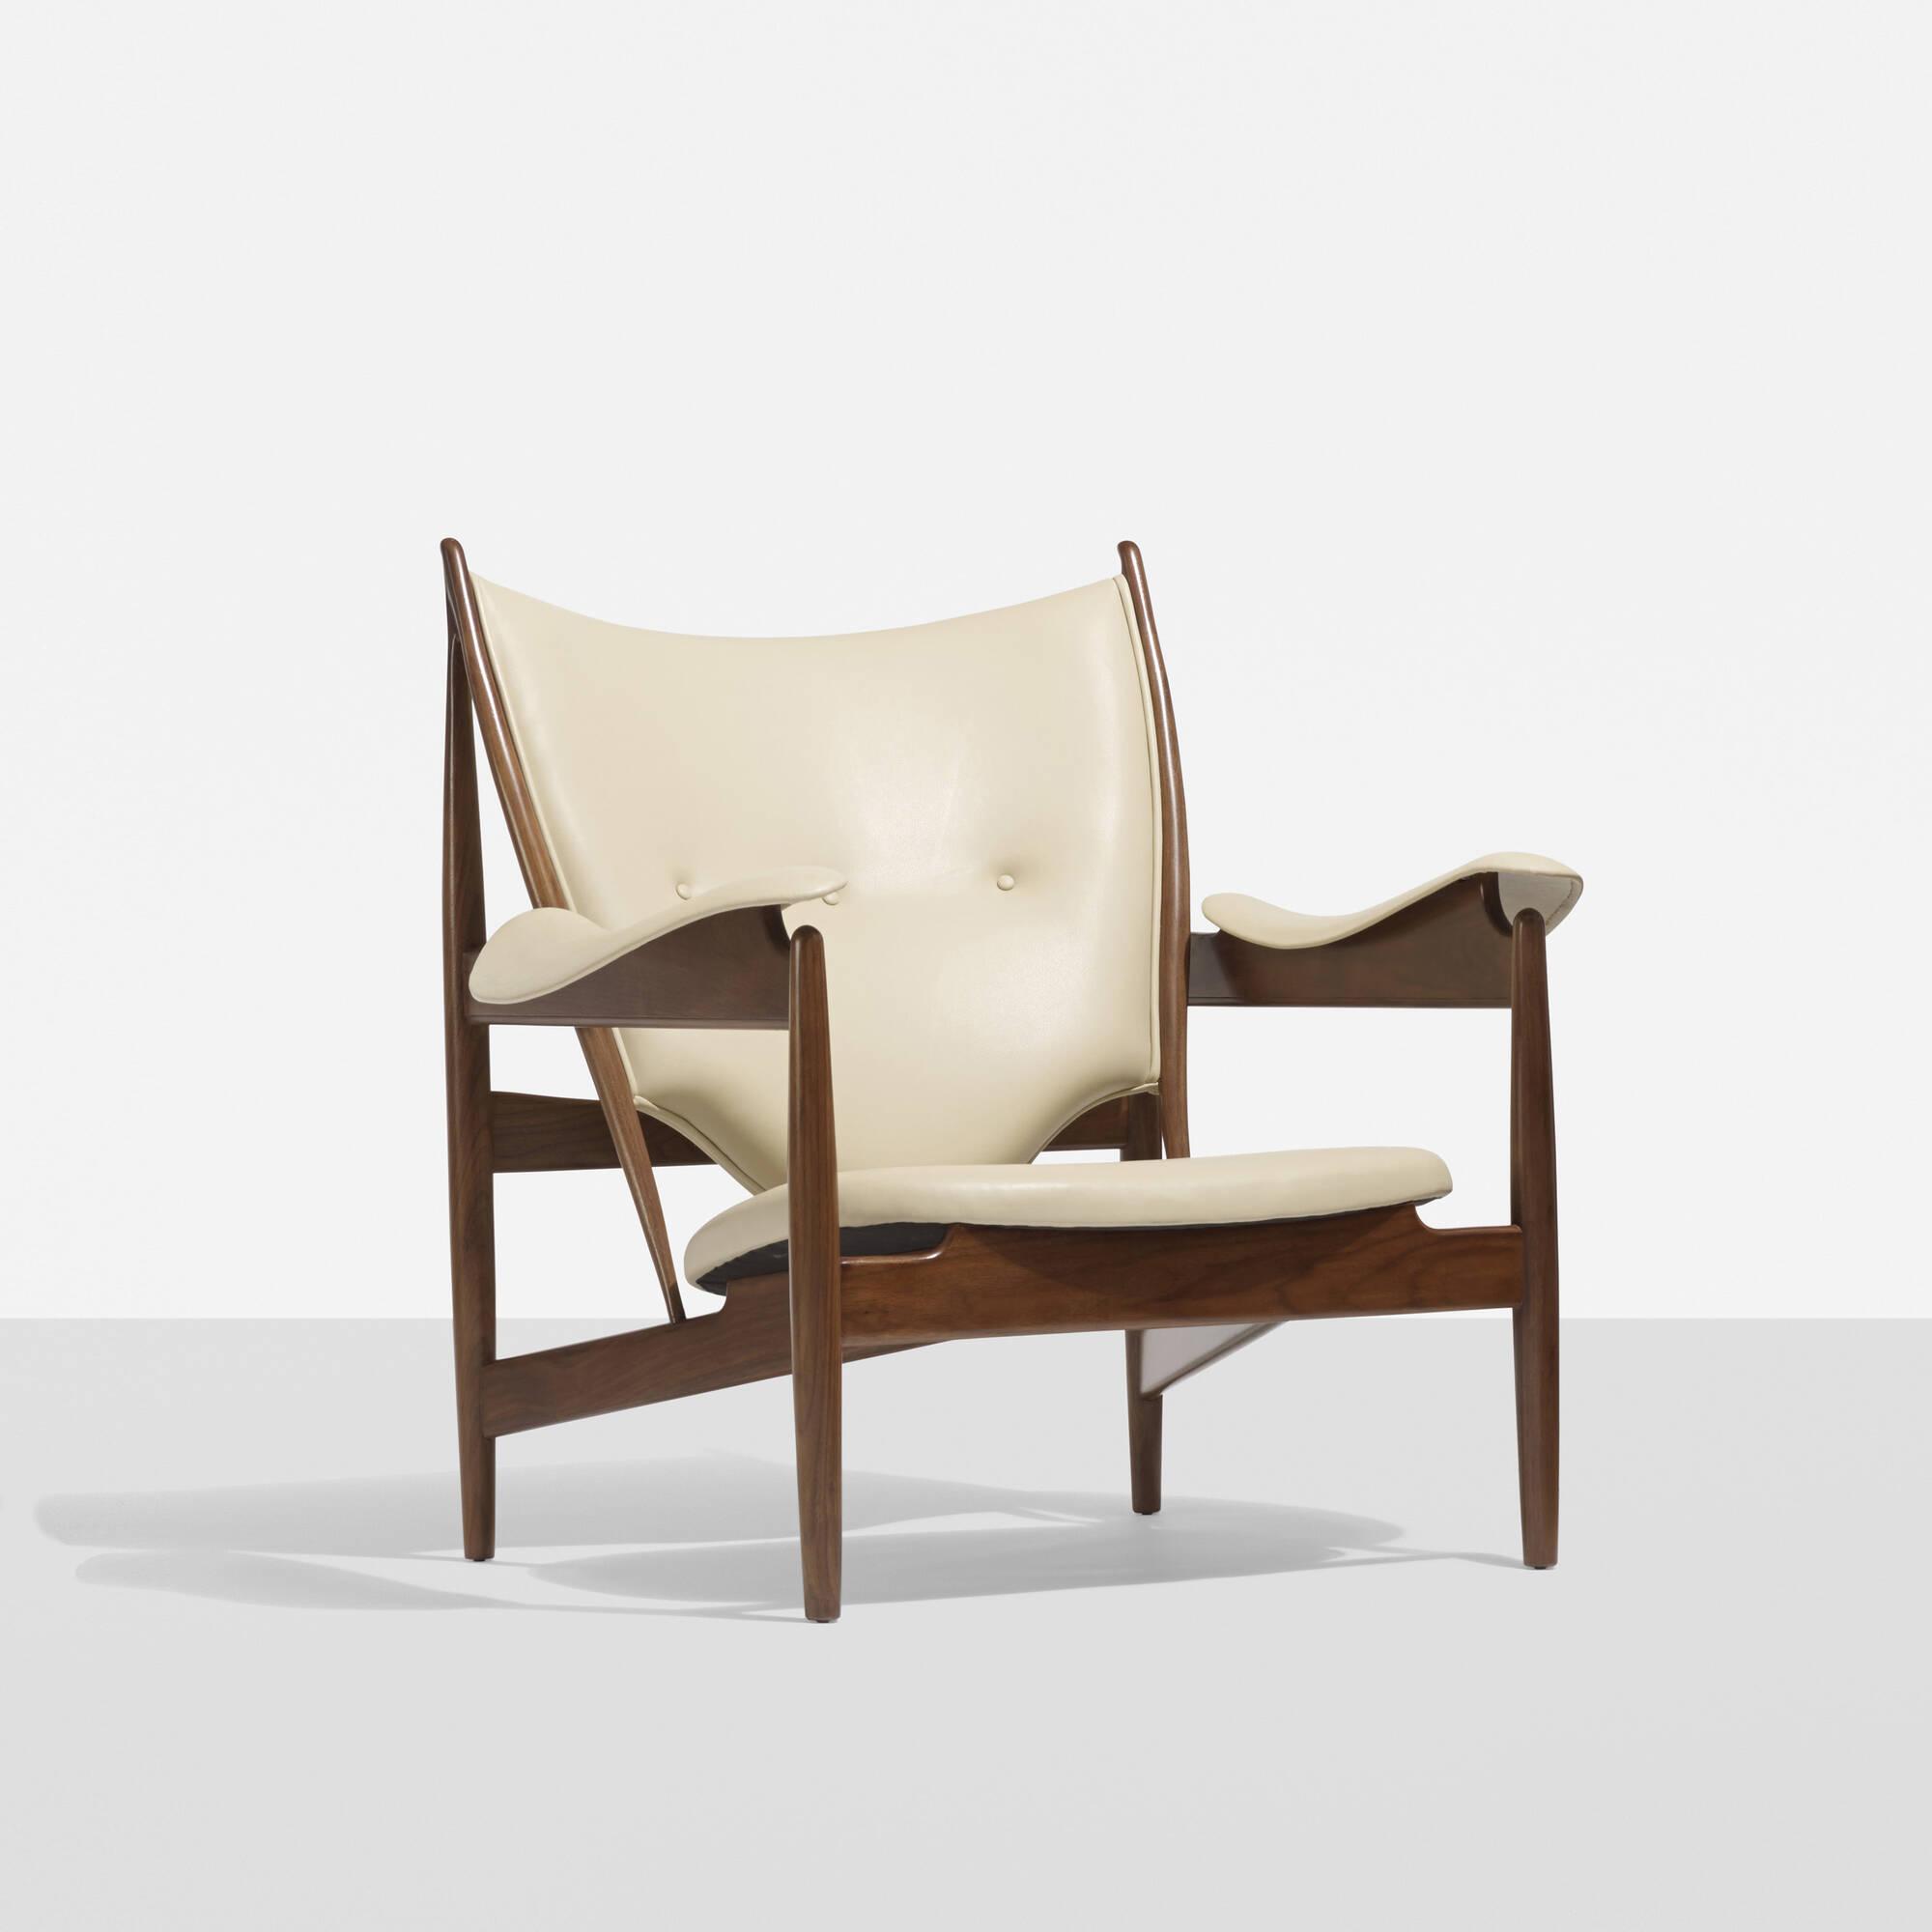 130: Finn Juhl / Chieftain Lounge Chair (1 Of 6)